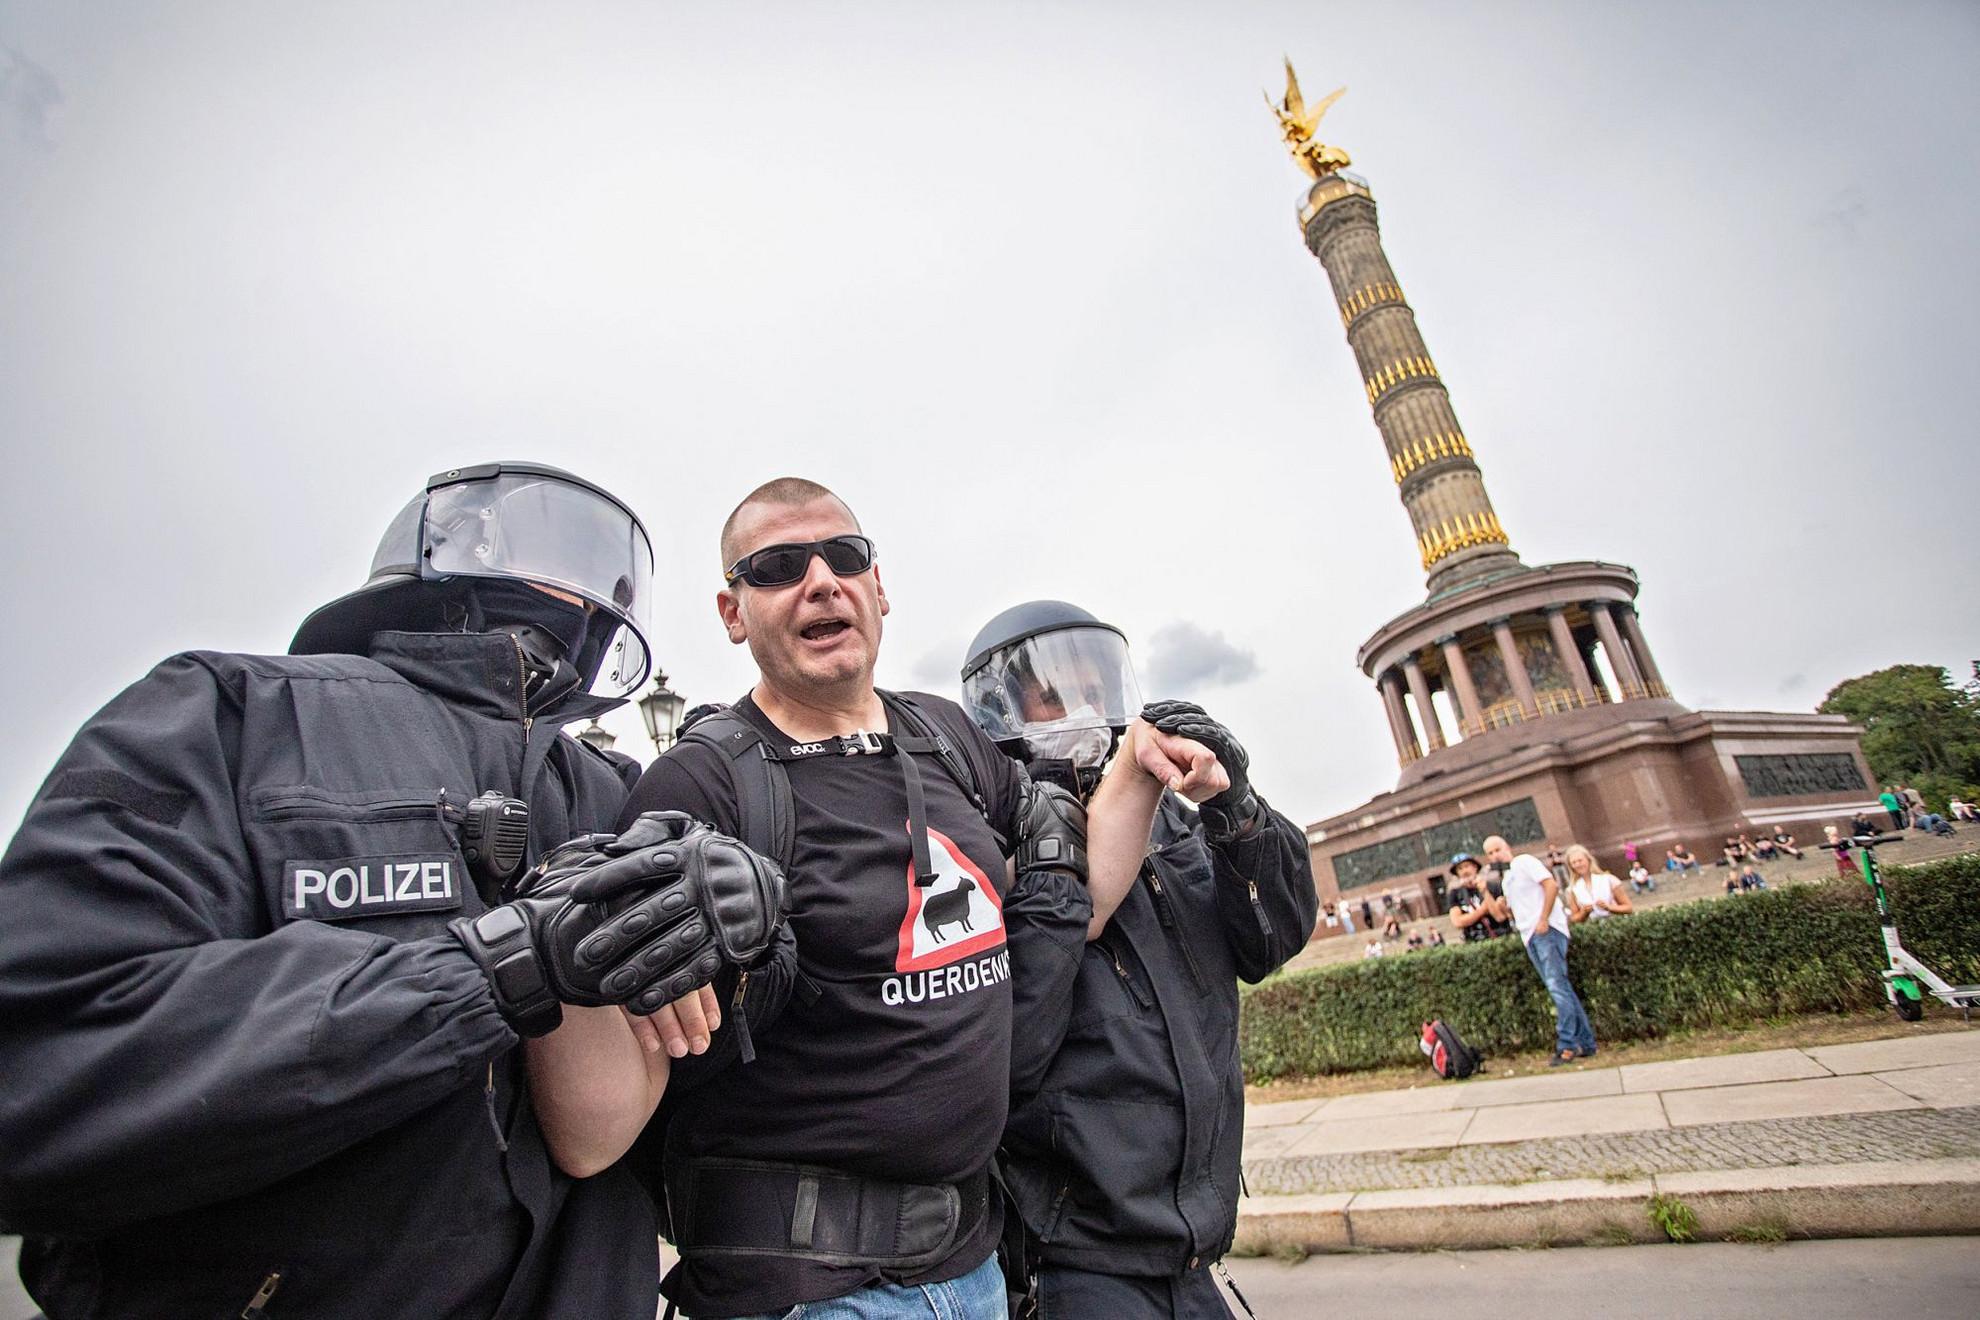 Paprikás hangulat Berlinben